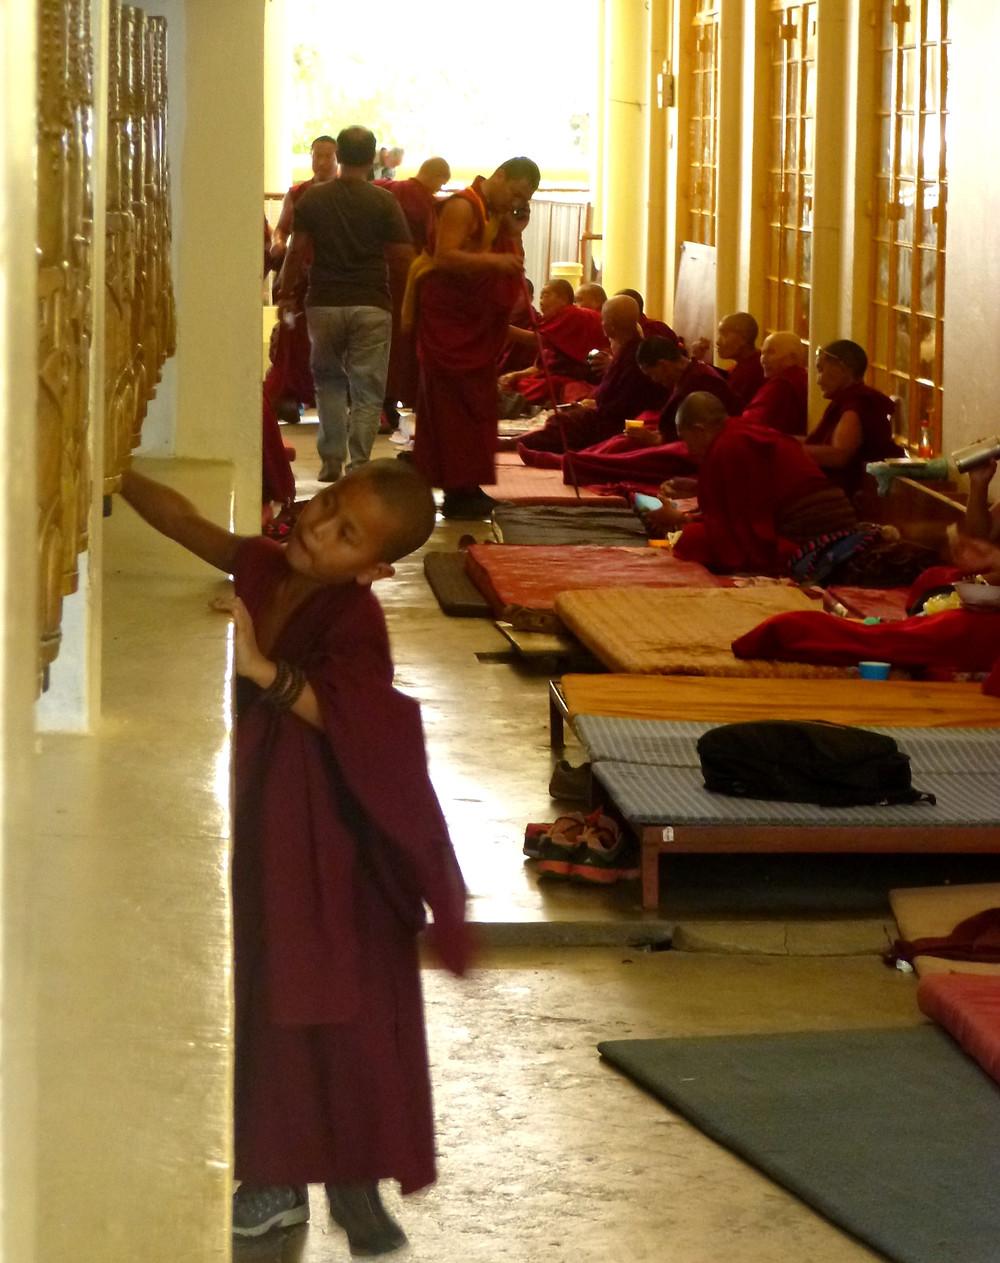 young tibetan monk, dalai lama temple, ahimsa, nonviolence, prayer wheel